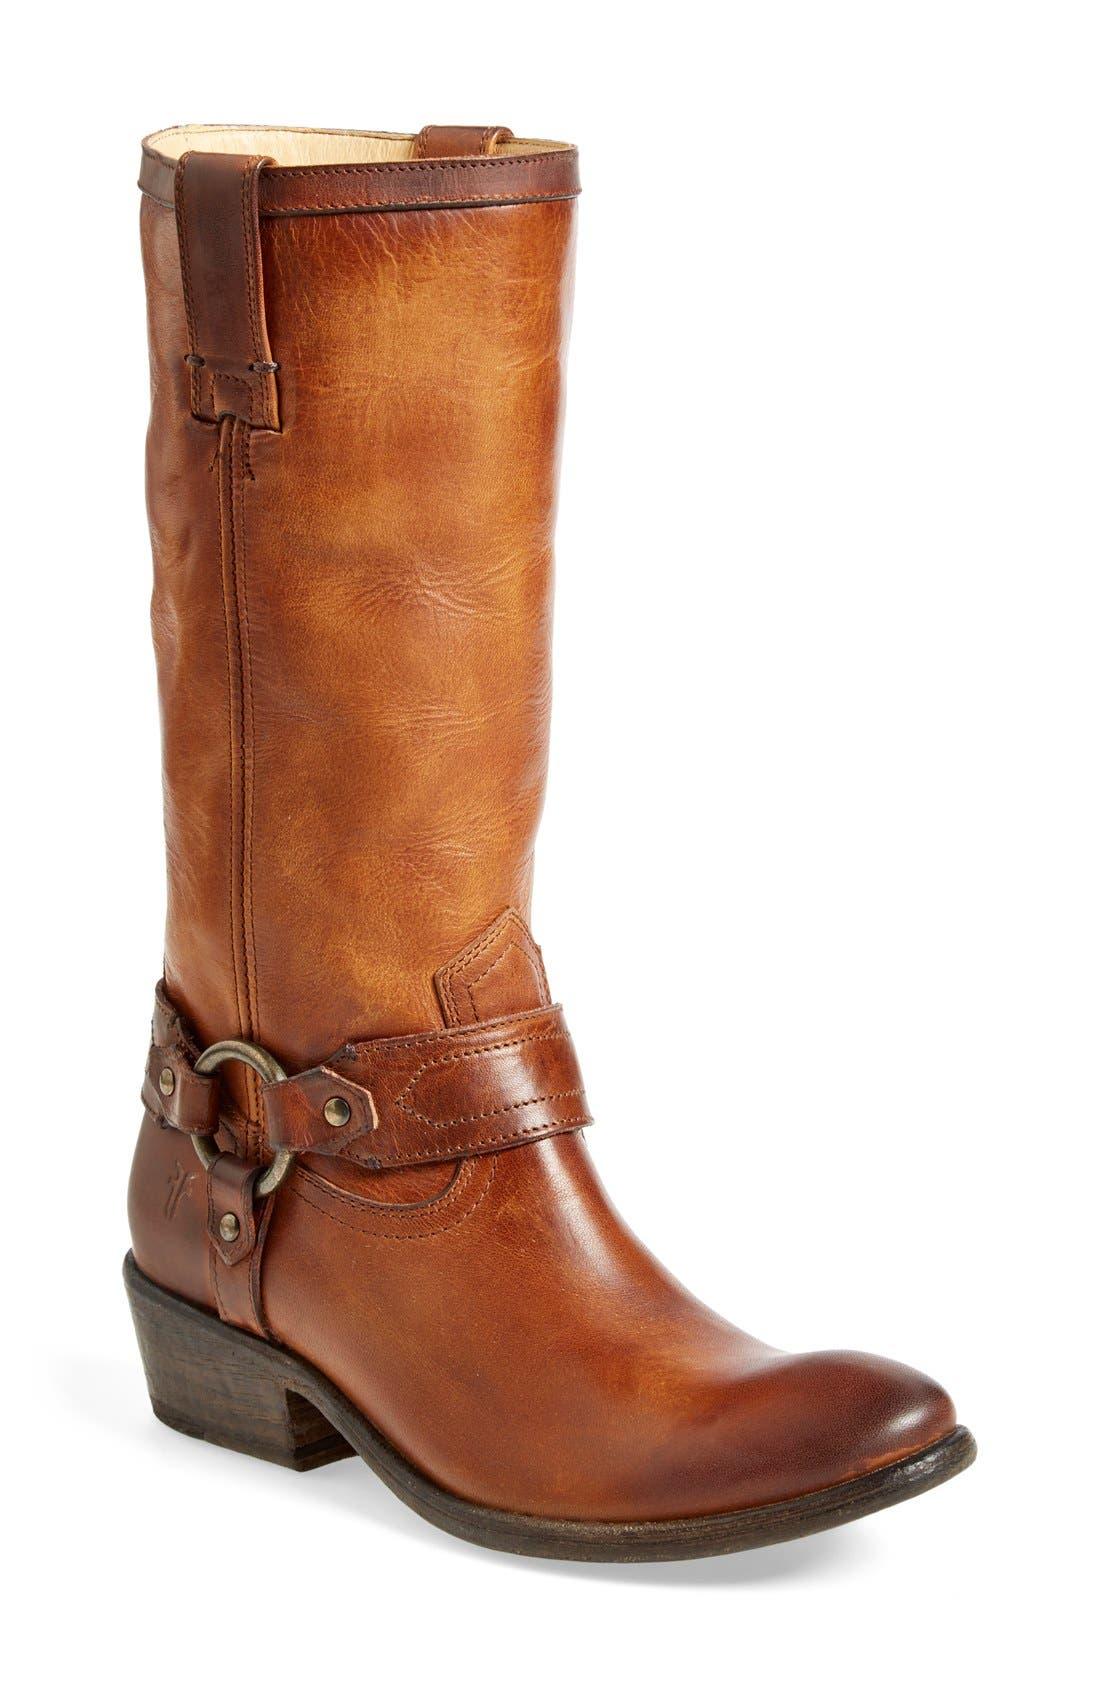 Main Image - Frye 'Carson Harness' Western Mid Calf Riding Boot (Women)